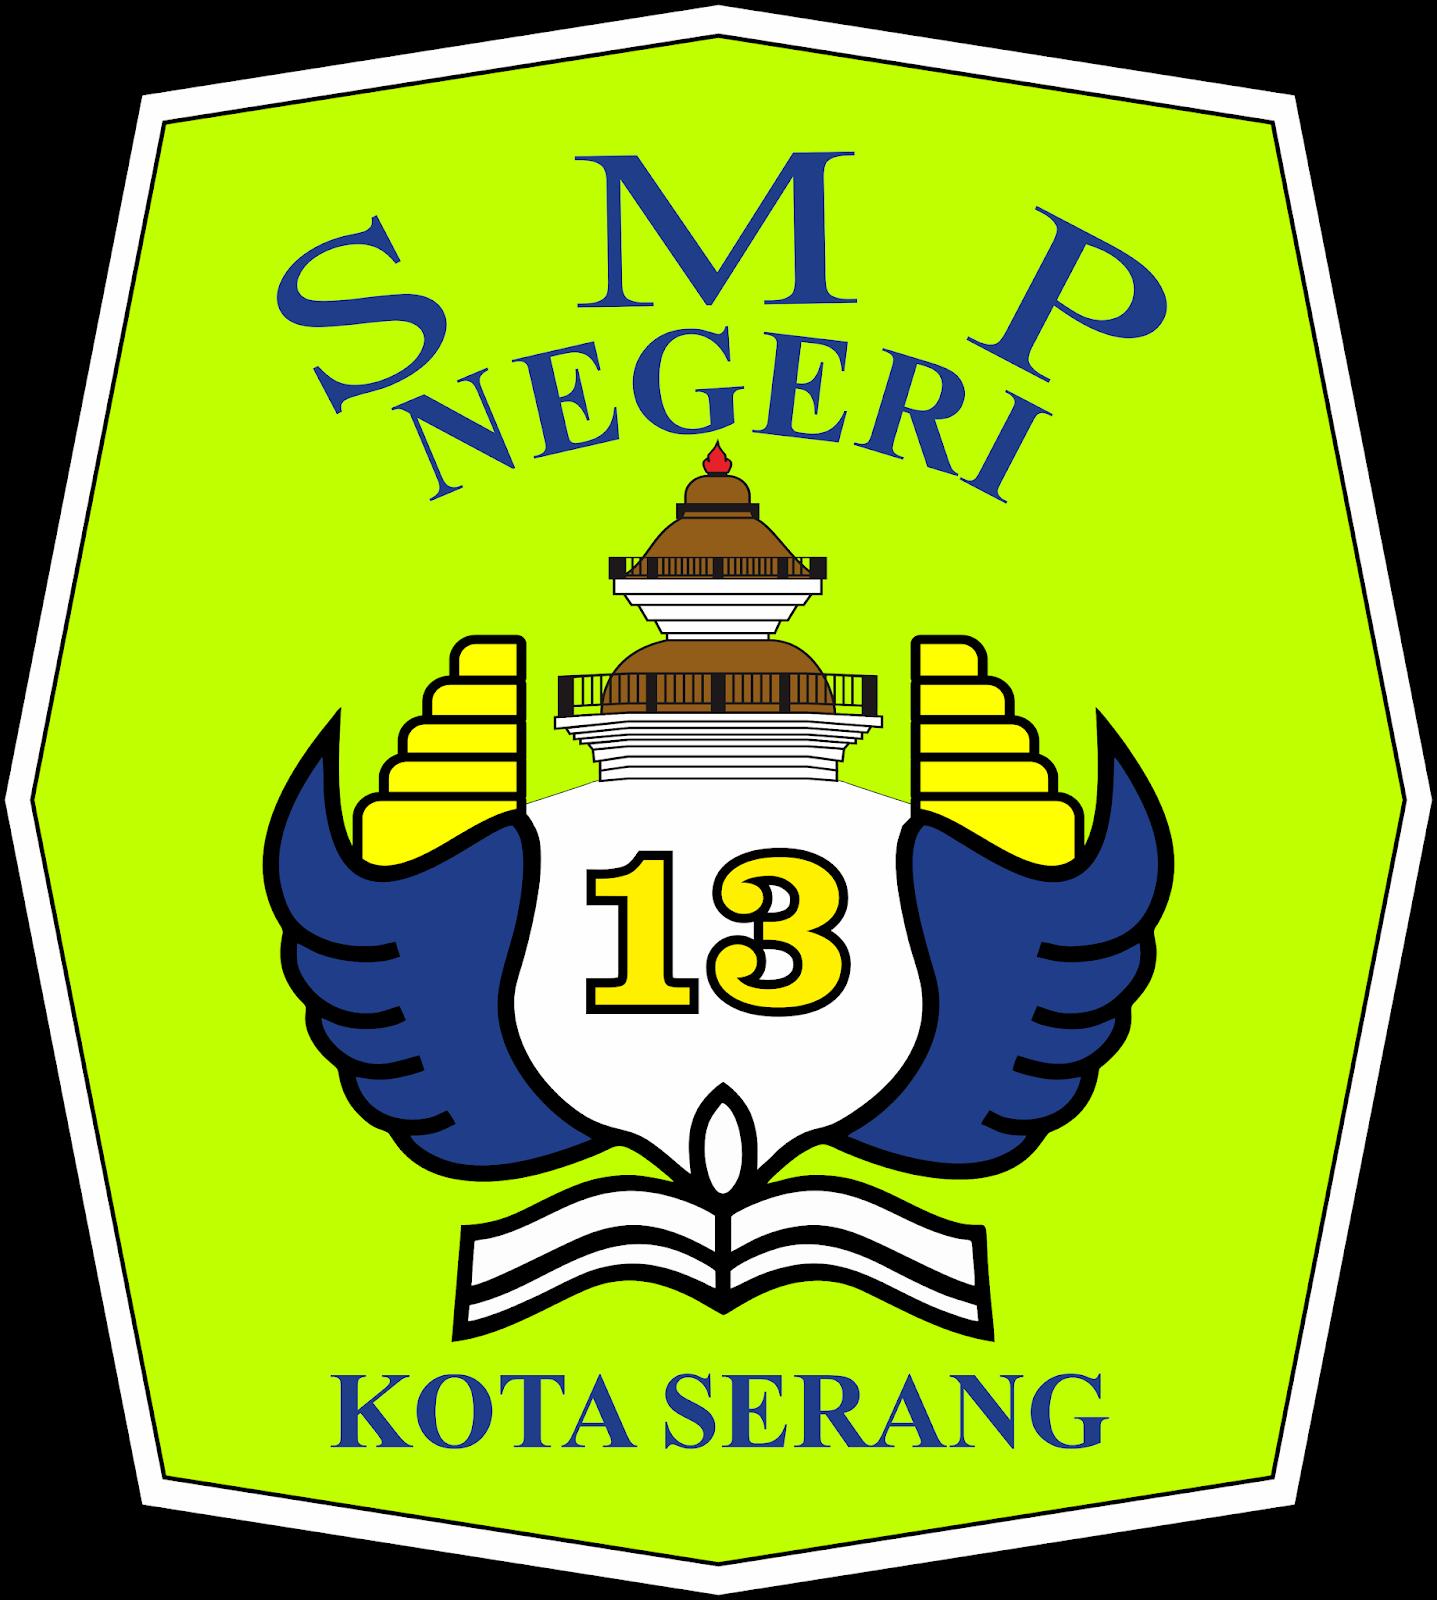 Dunia Logo Logo Smpn 13 Kota Serang Png